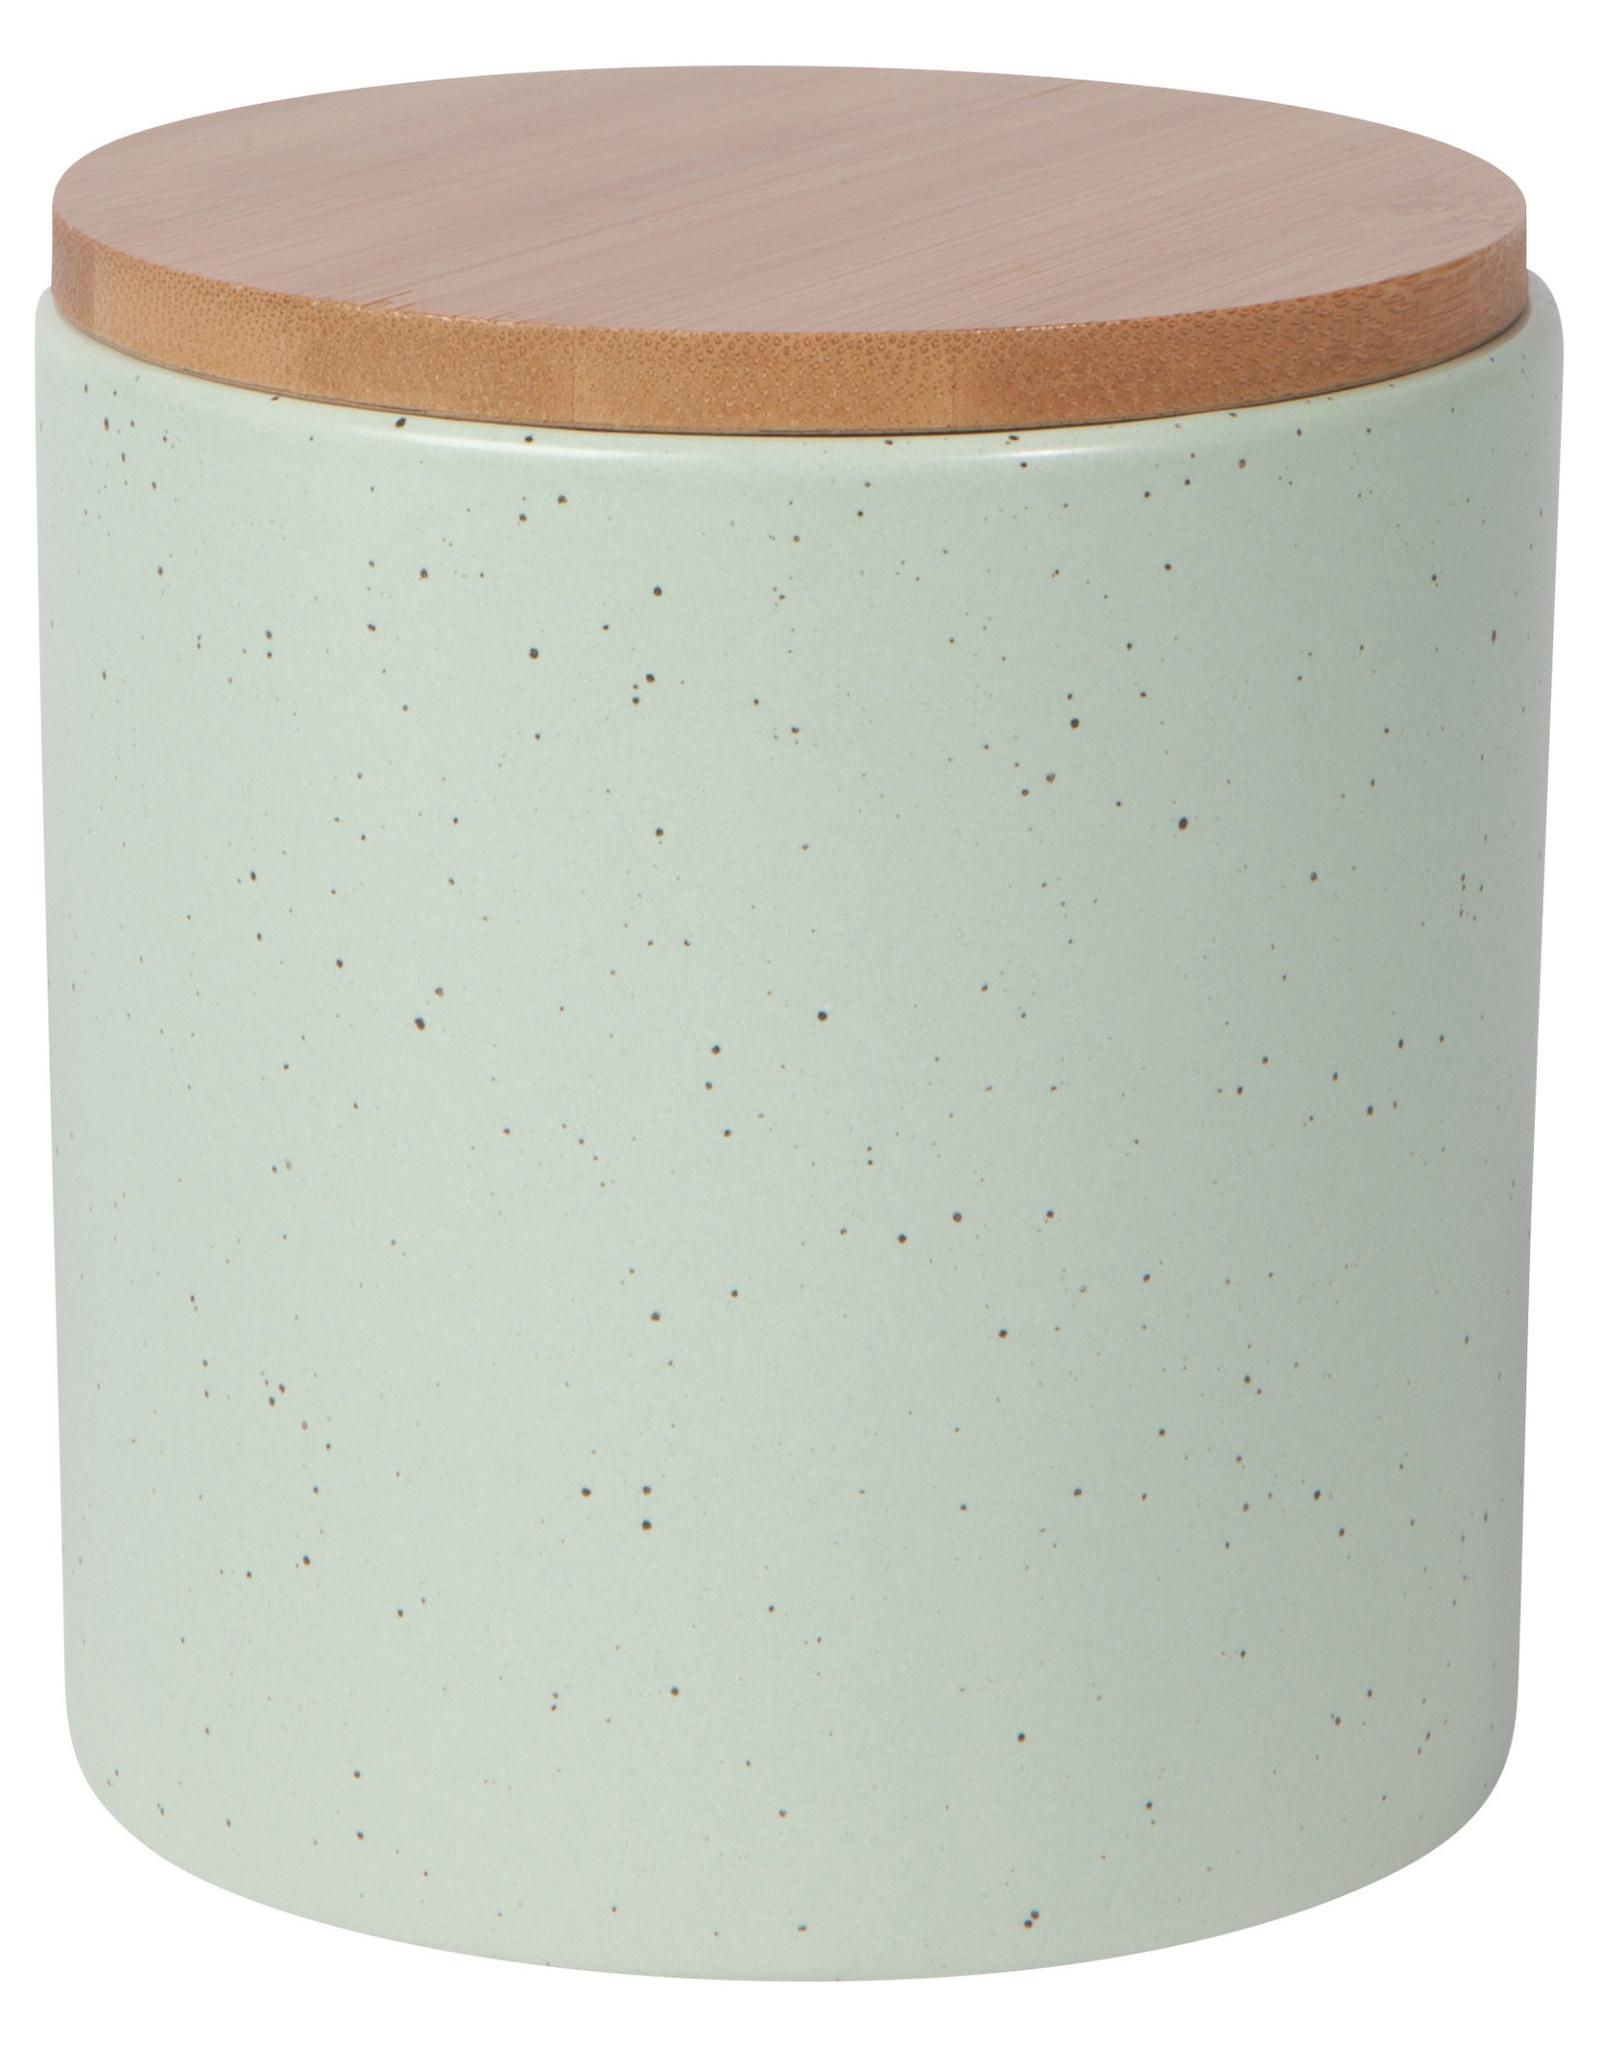 Danica - Stoneware Canister Medium - Seafoam